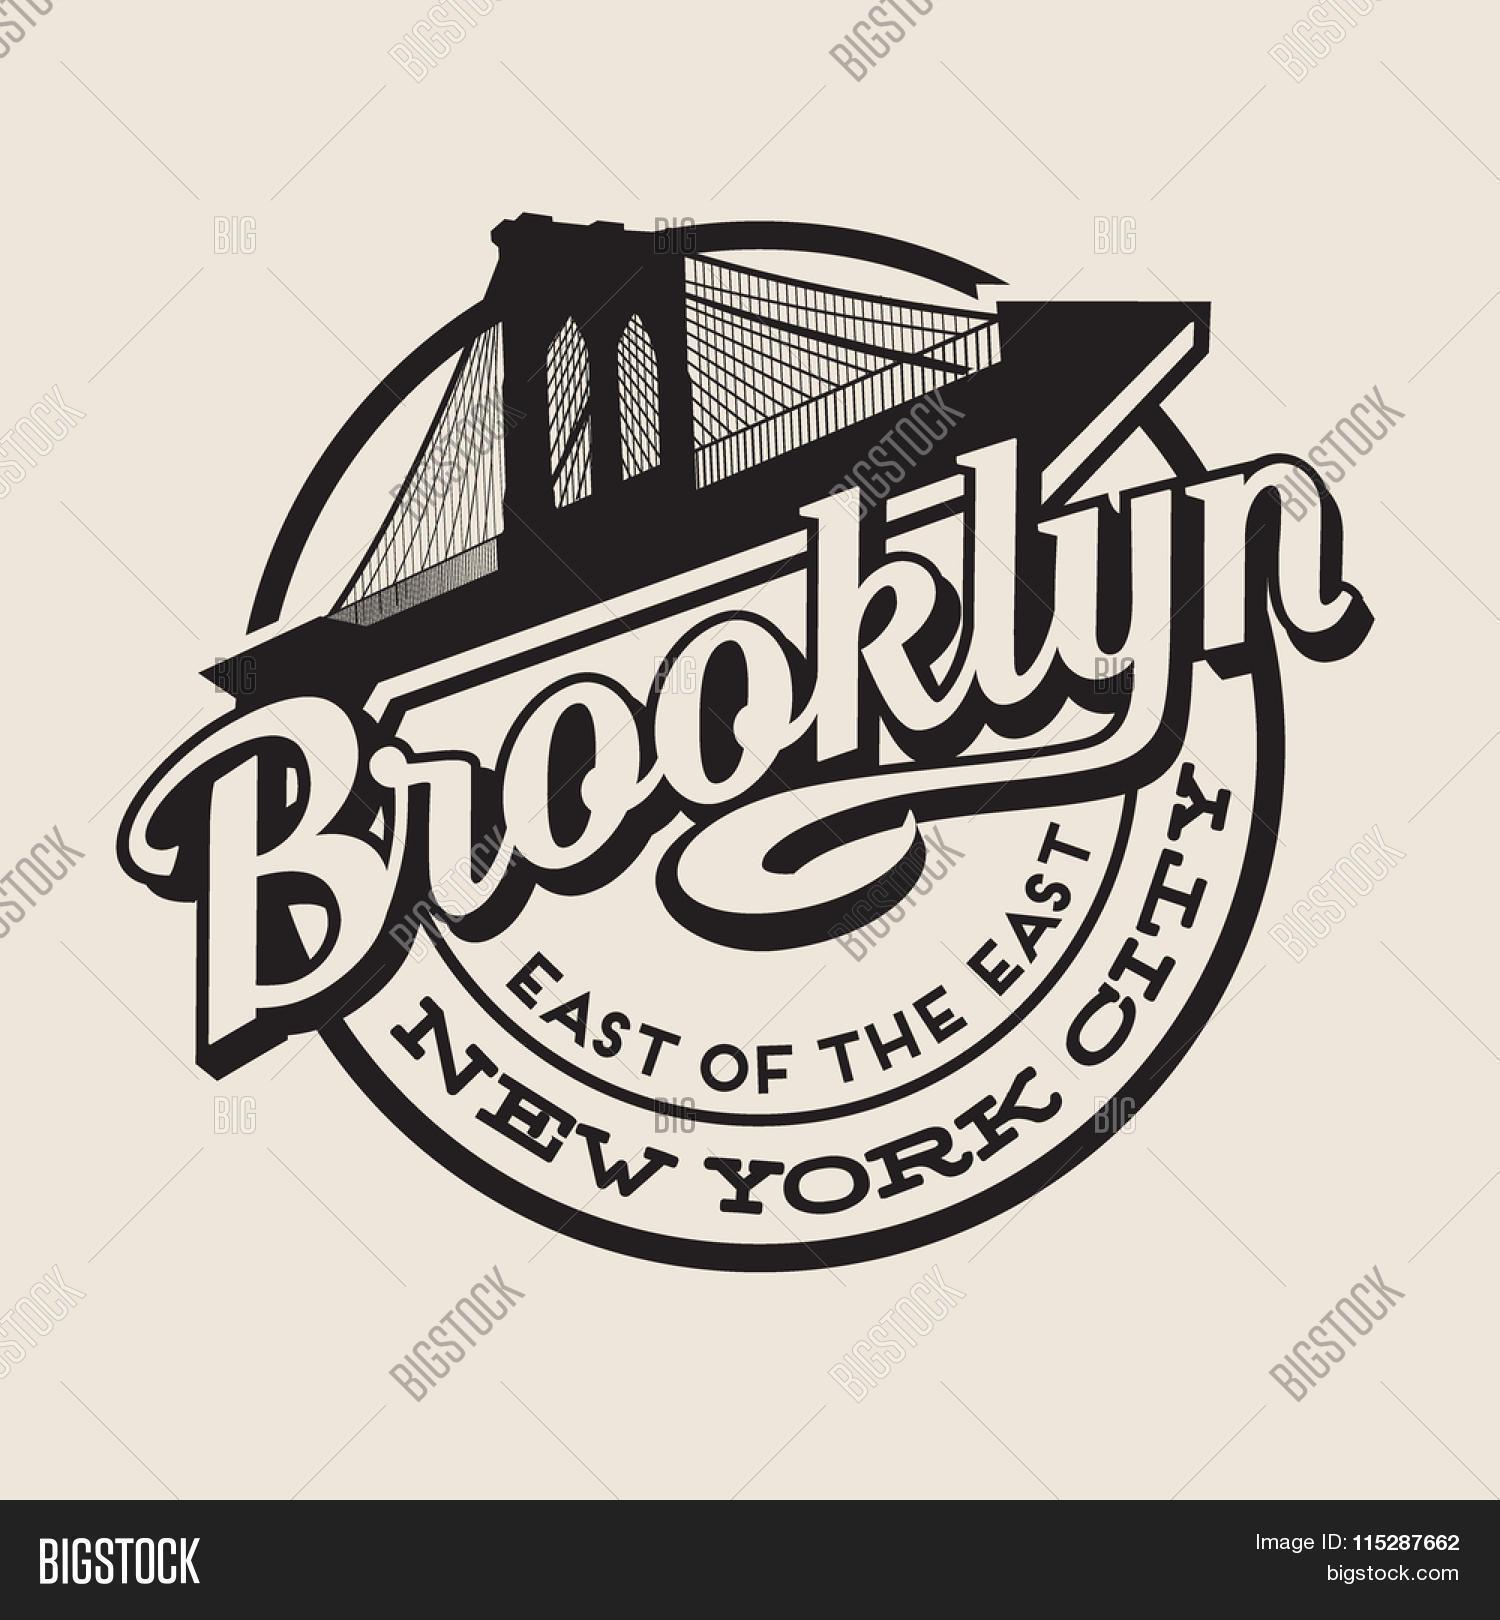 Brooklyn new york vector photo free trial bigstock for T shirt printing brooklyn